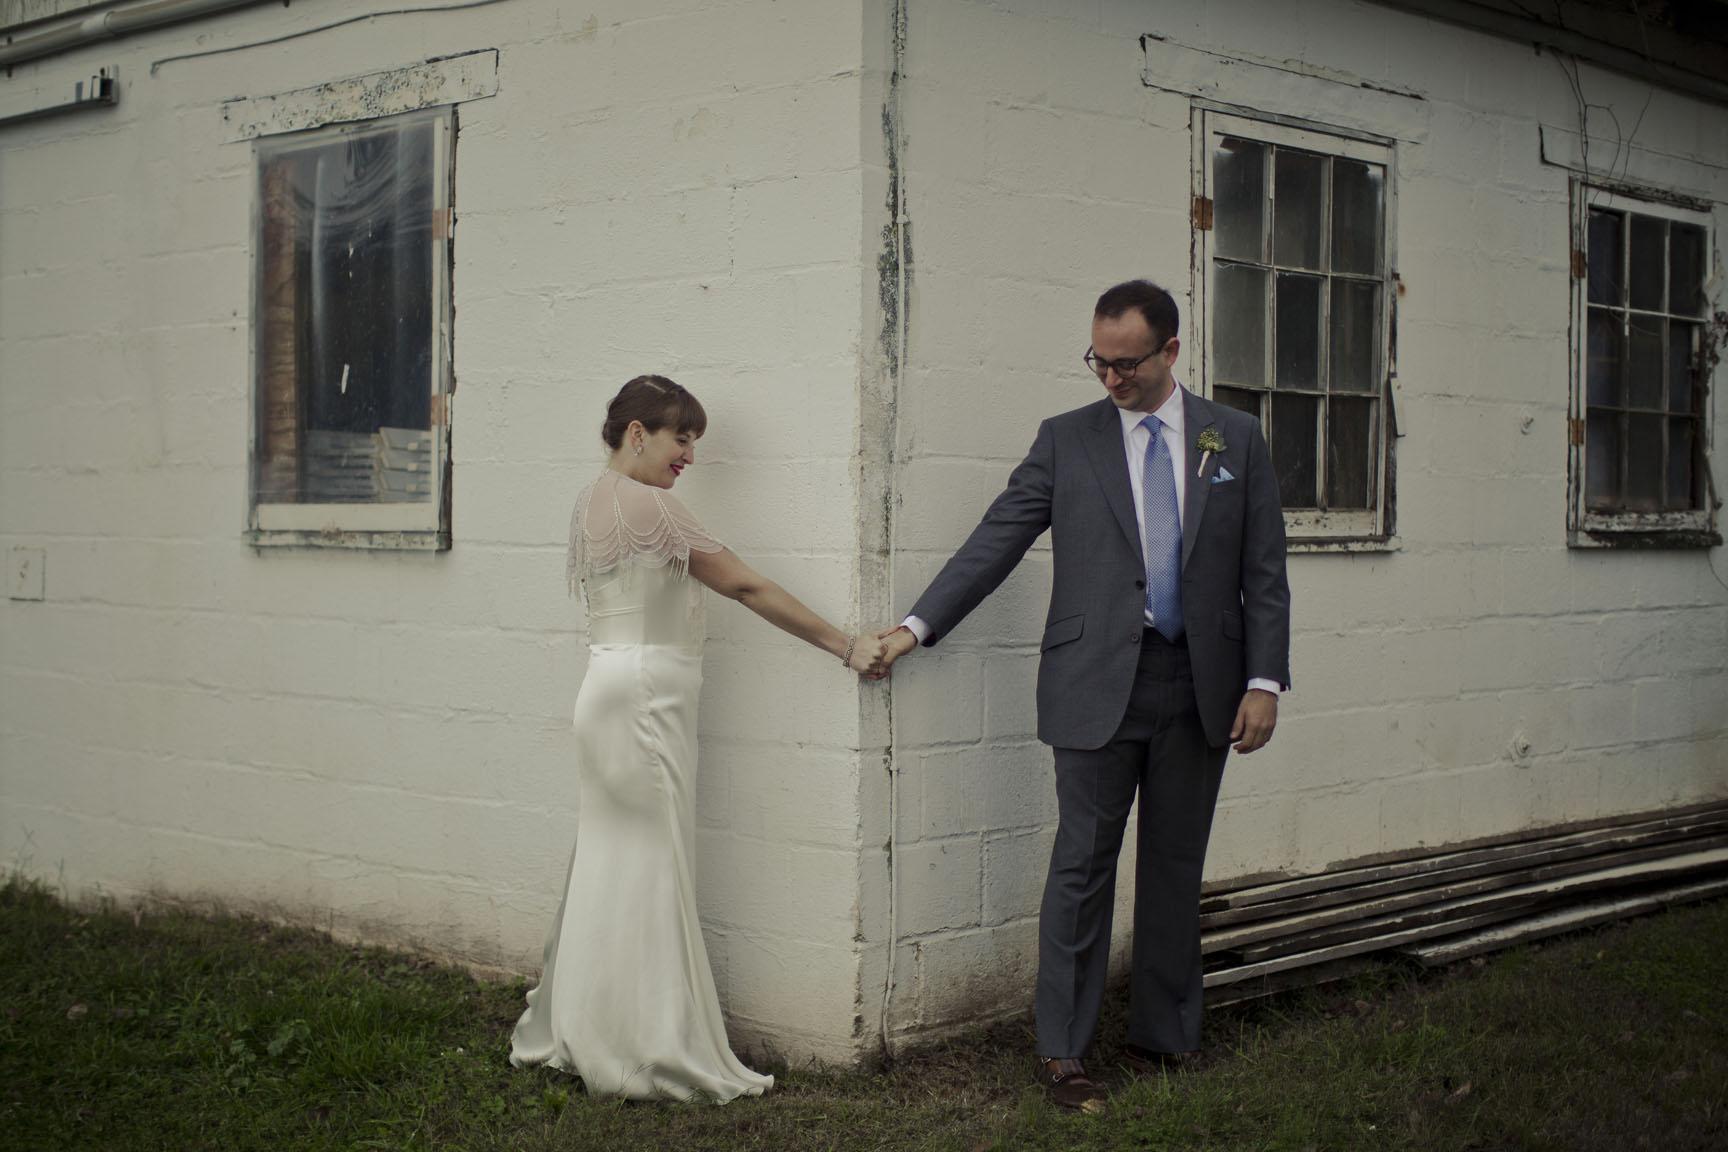 SGP_Alison&Dave_TheStory052